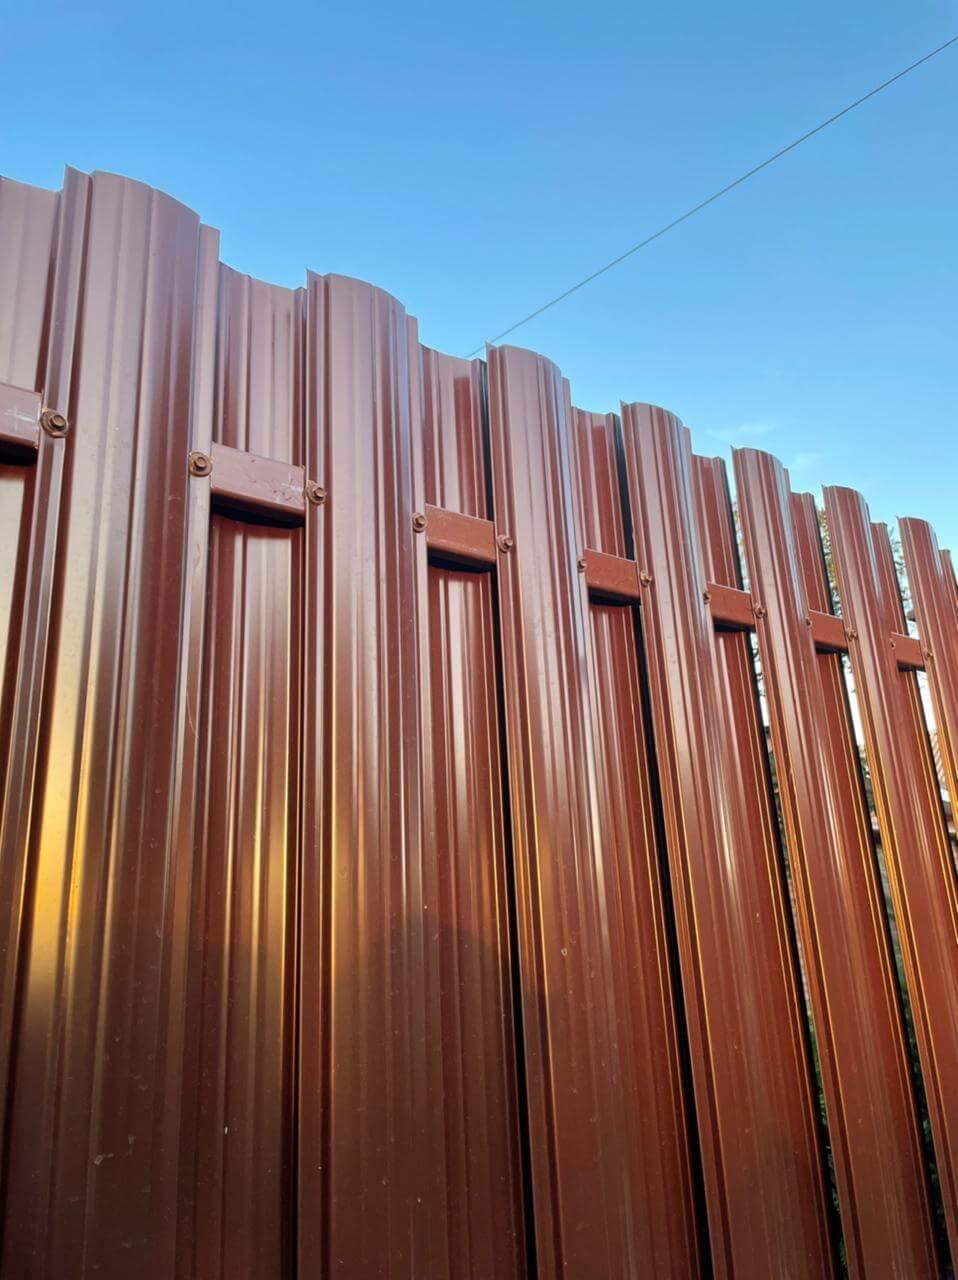 забор из штакетника шоколад двухсторонний фото2